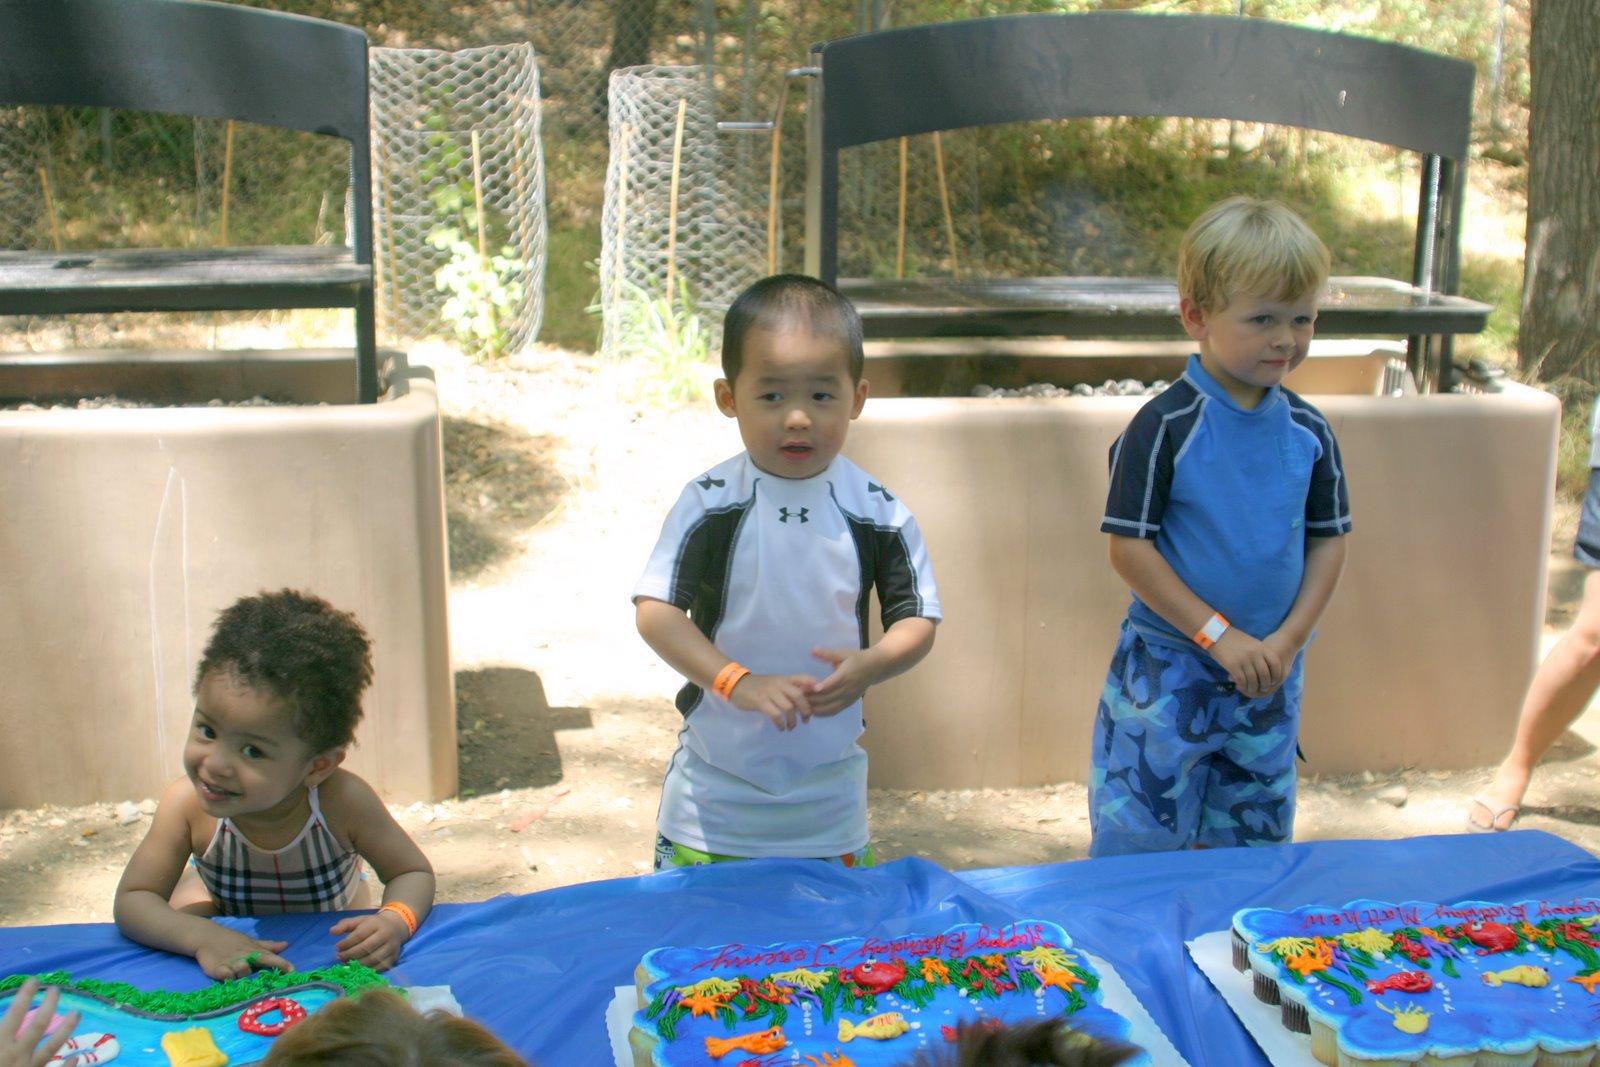 July 2009 - Blackberry farm cupertino swimming pool ...